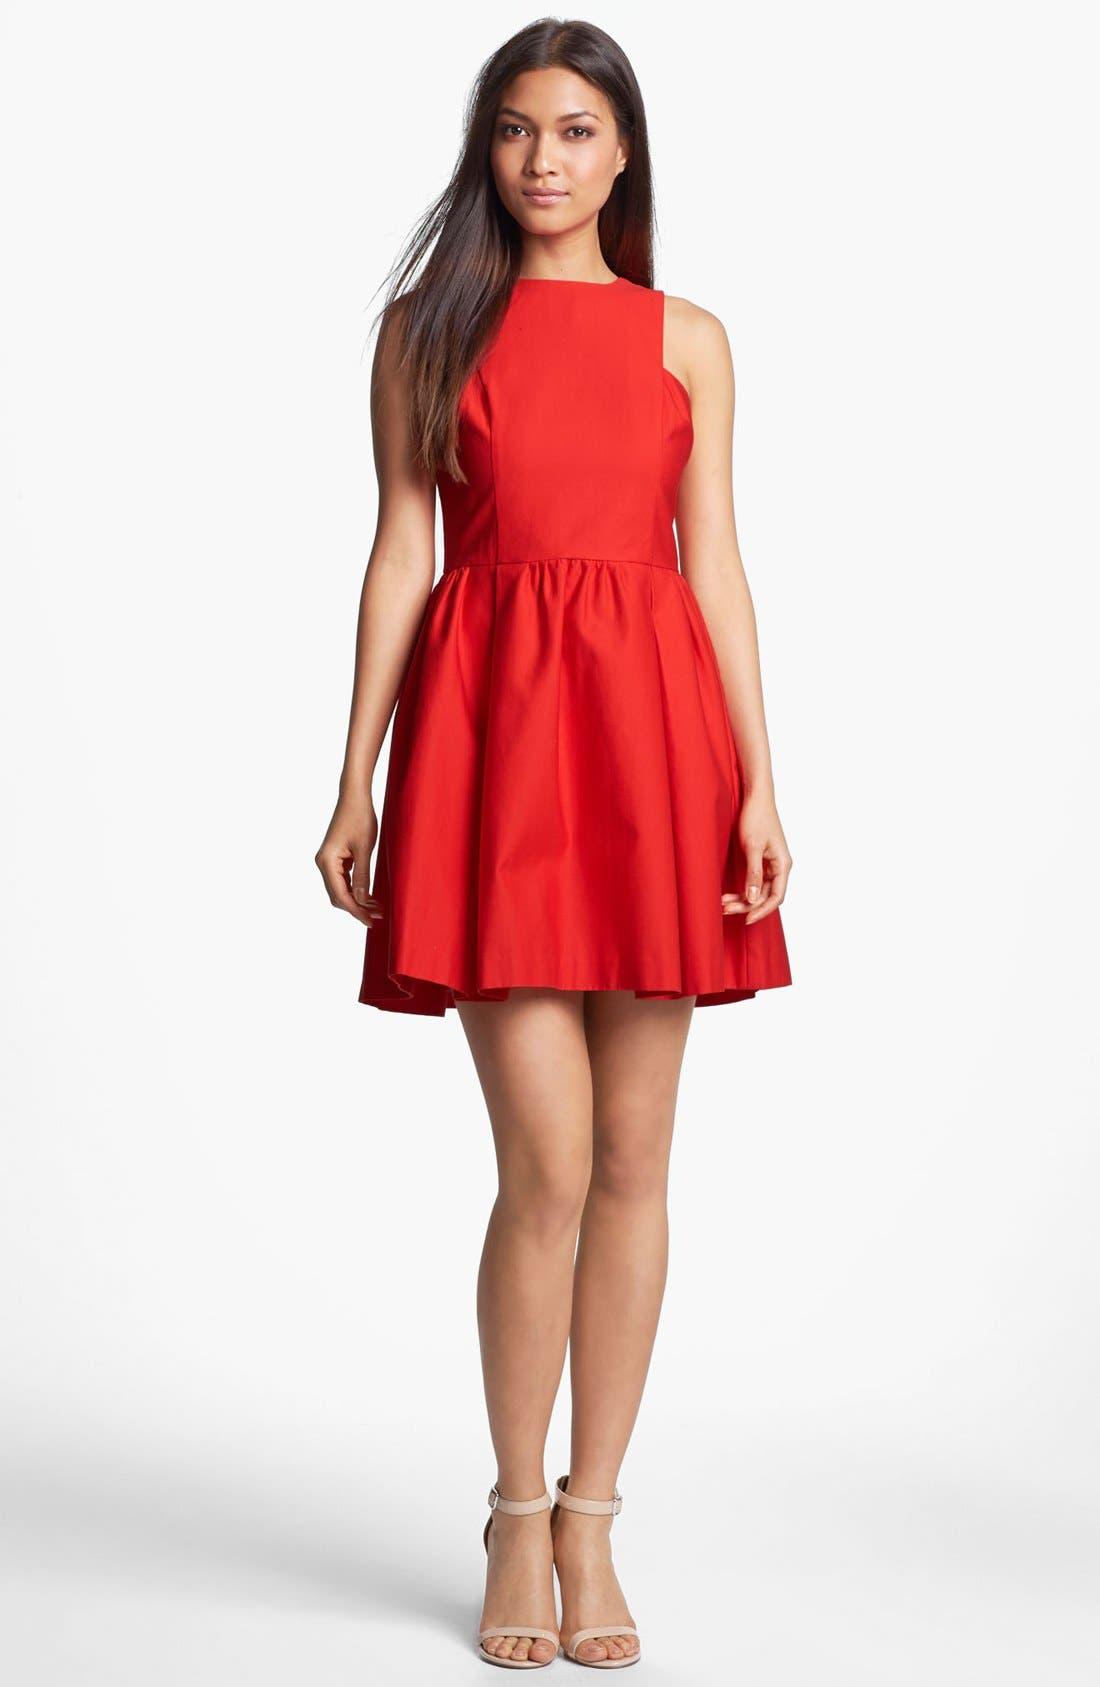 Alternate Image 1 Selected - BB Dakota 'Anisa' Cotton Fit & Flare Dress